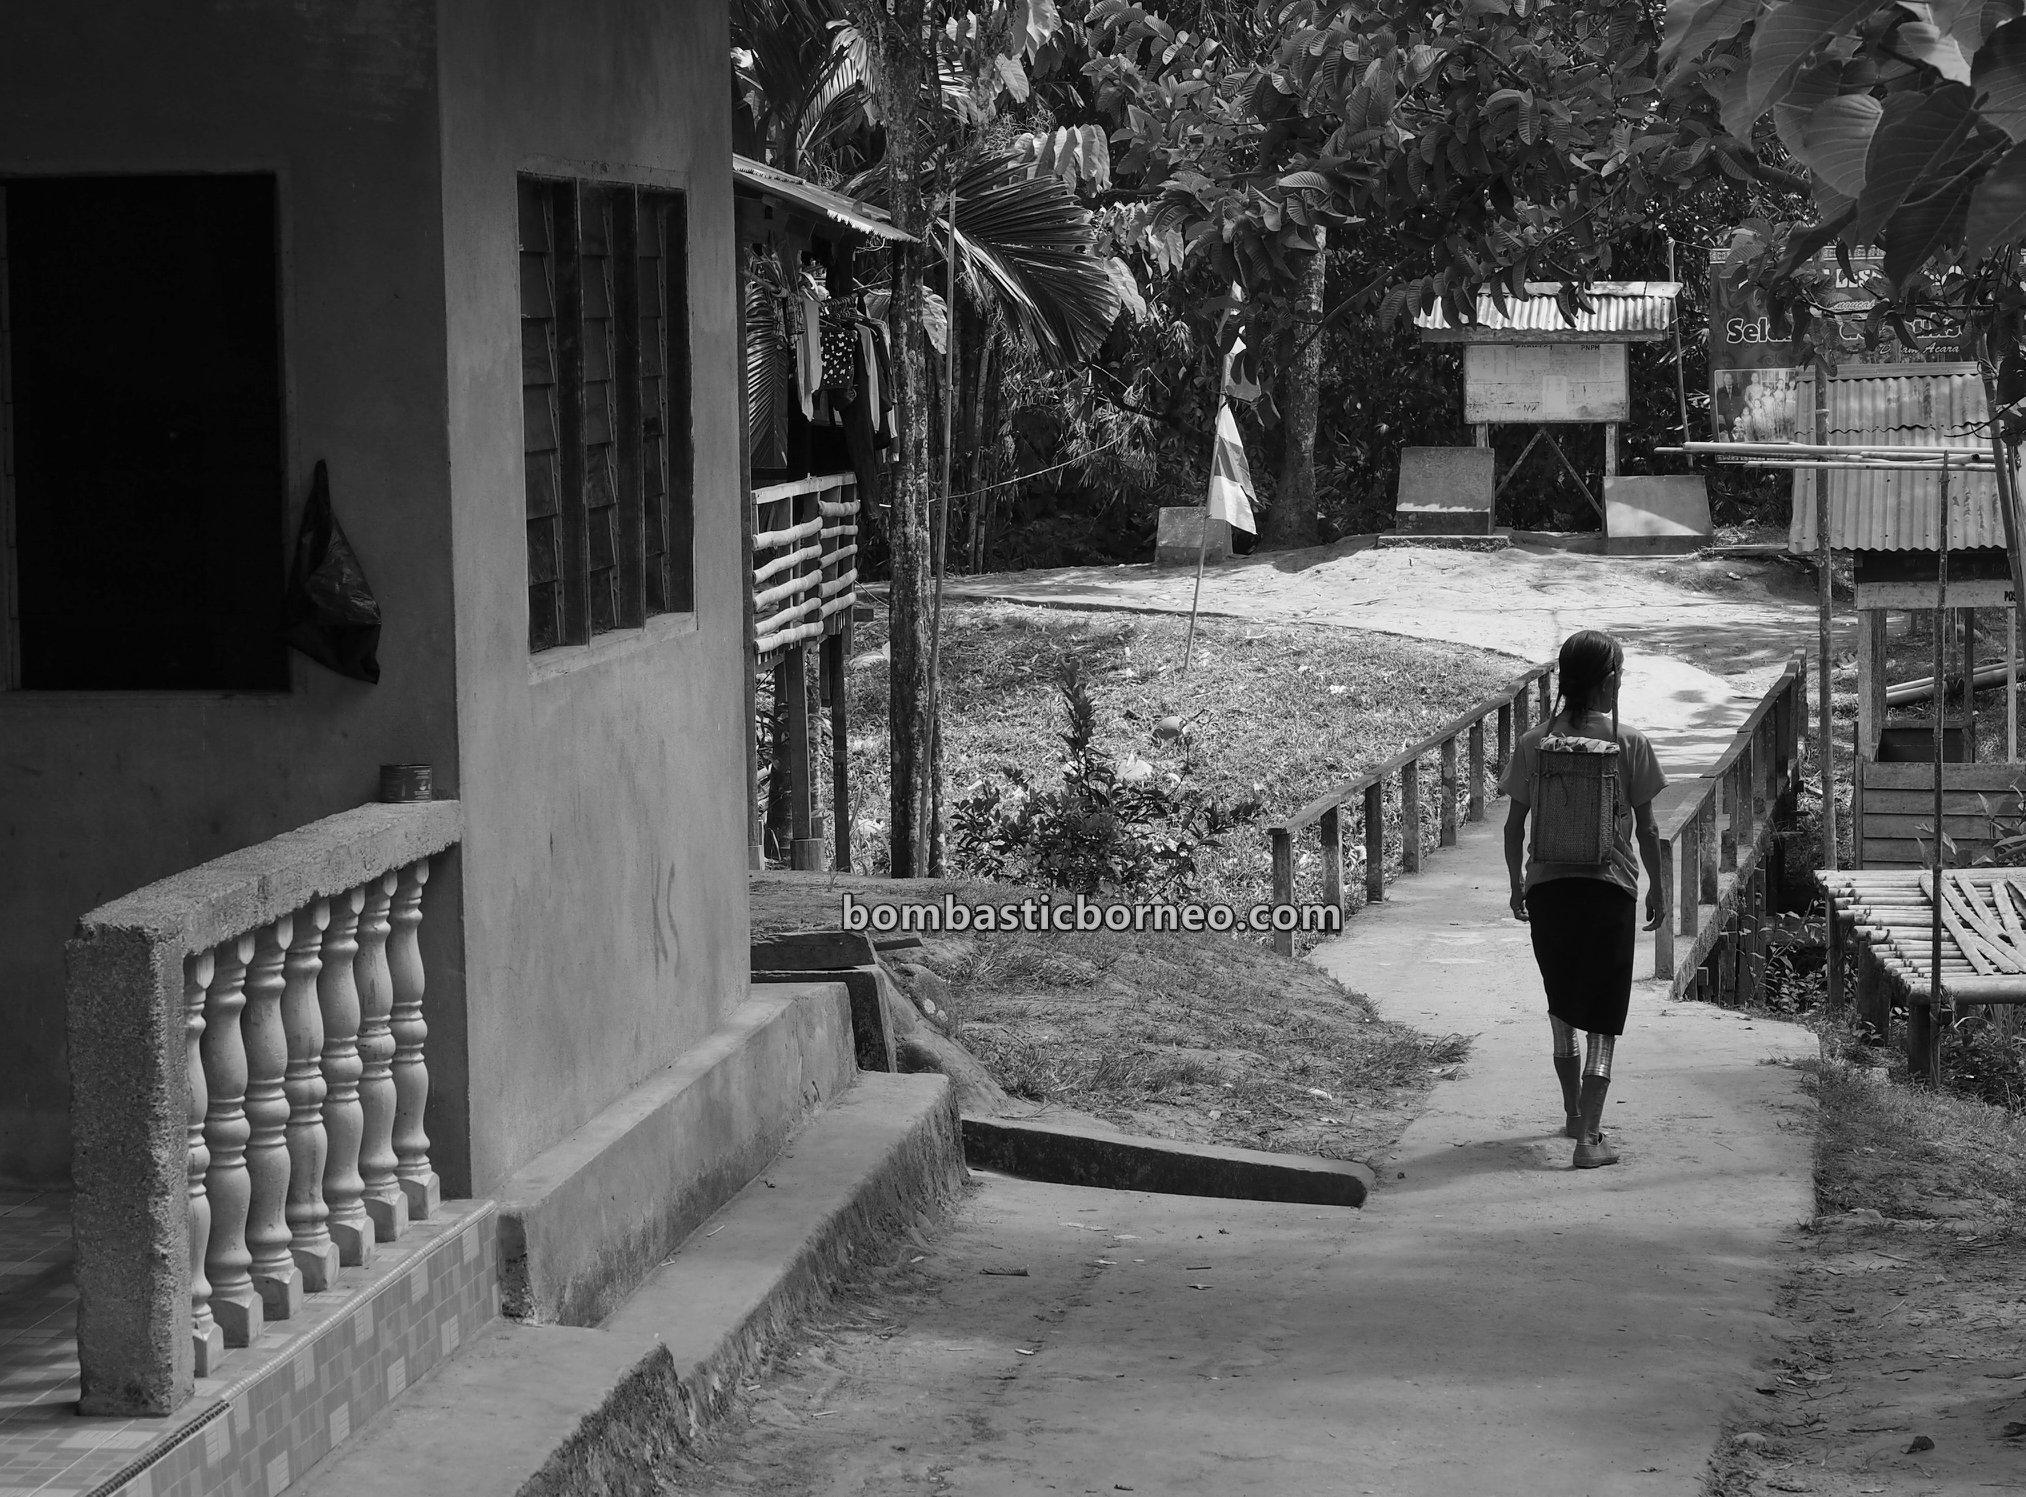 Gelang Tembaga, Sungkung Anep, Dusun Medeng, traditional, Bengkayang, West Kalimantan, ethnic, native, village, tourist attraction, travel guide, Trans Border, Borneo, 跨境婆罗洲达雅, 印尼西加里曼丹, 孟加映宋宫部落,